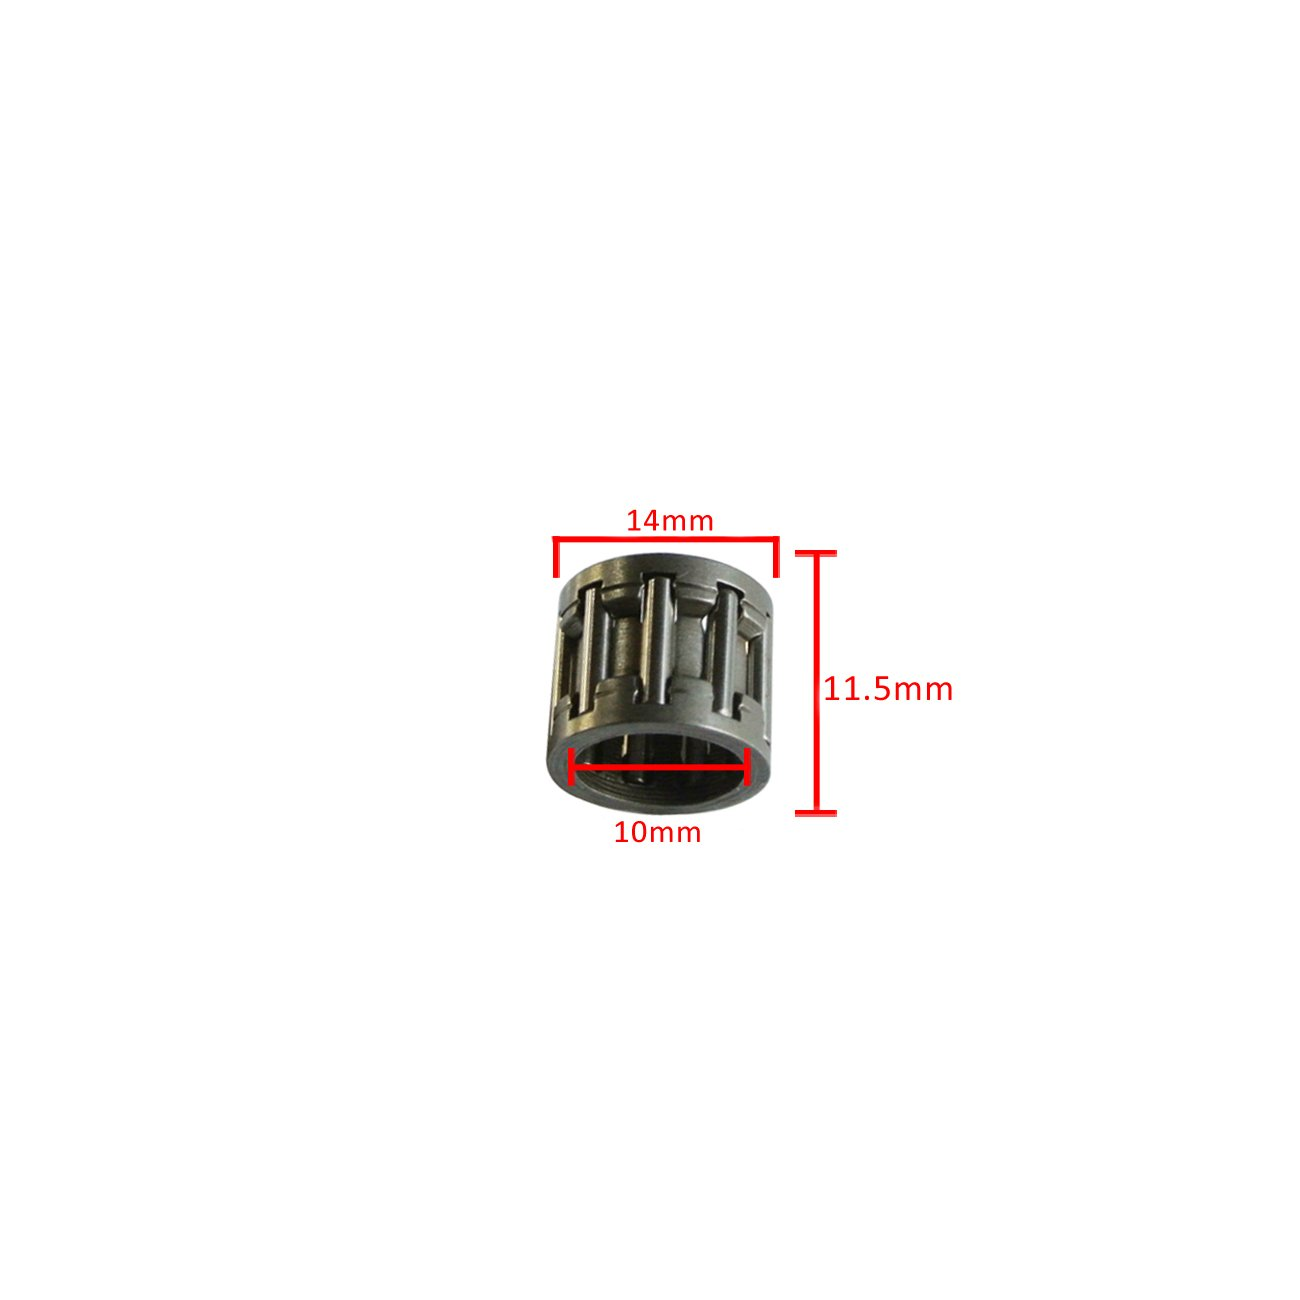 UAUS New Crankshaft Assembly Kit For STIHL Chainsaw MS170 MS180 017 018 Engine Motor # 1132 030 0402